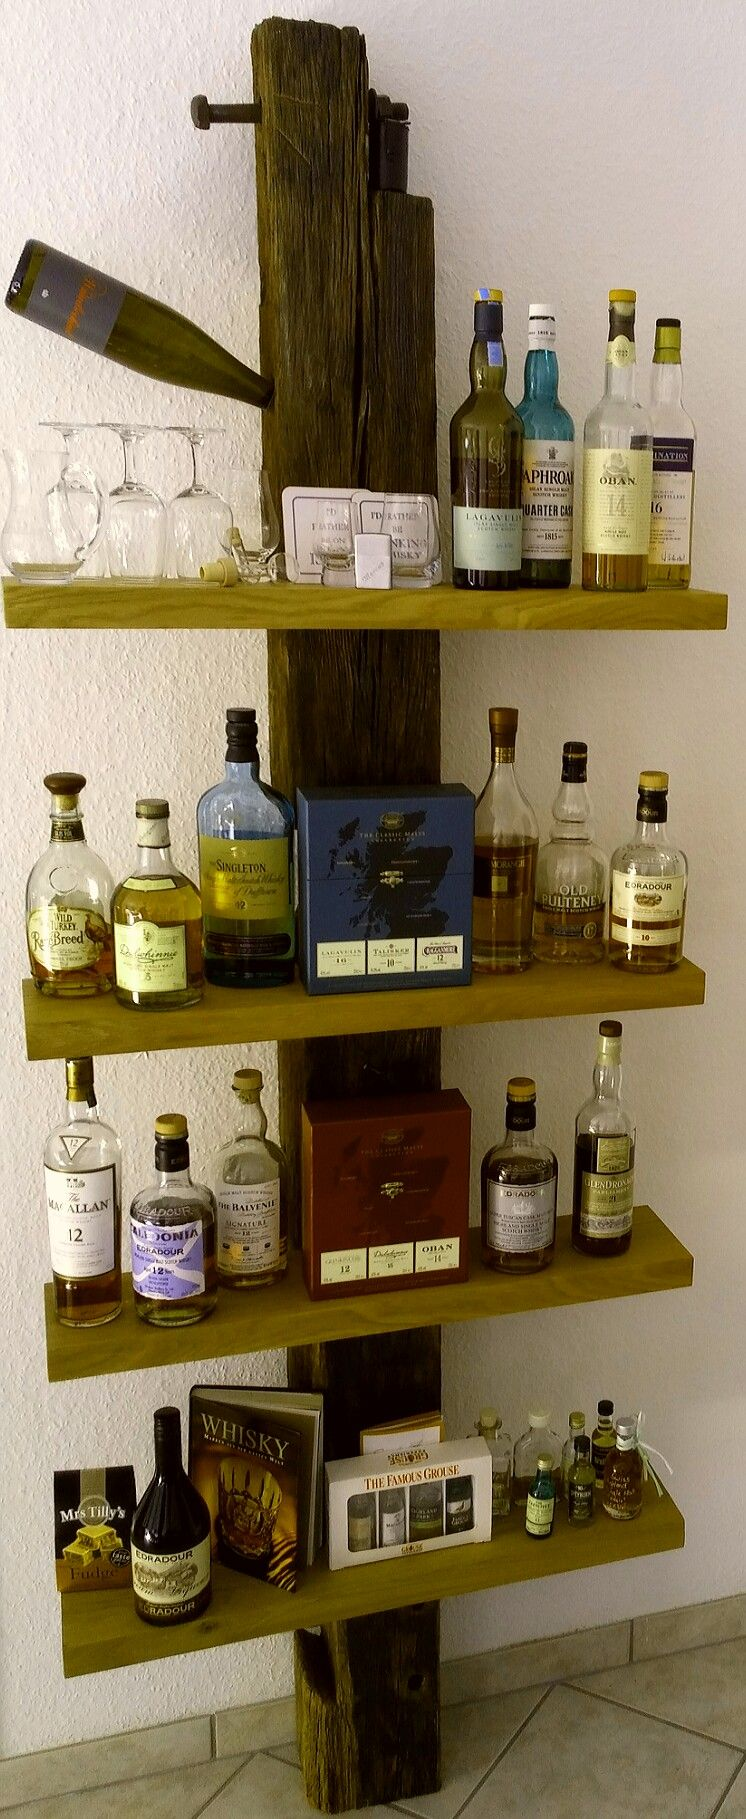 Whisky Schrank | Scotch Bar | Pinterest | Whisky, Bar and Bar carts